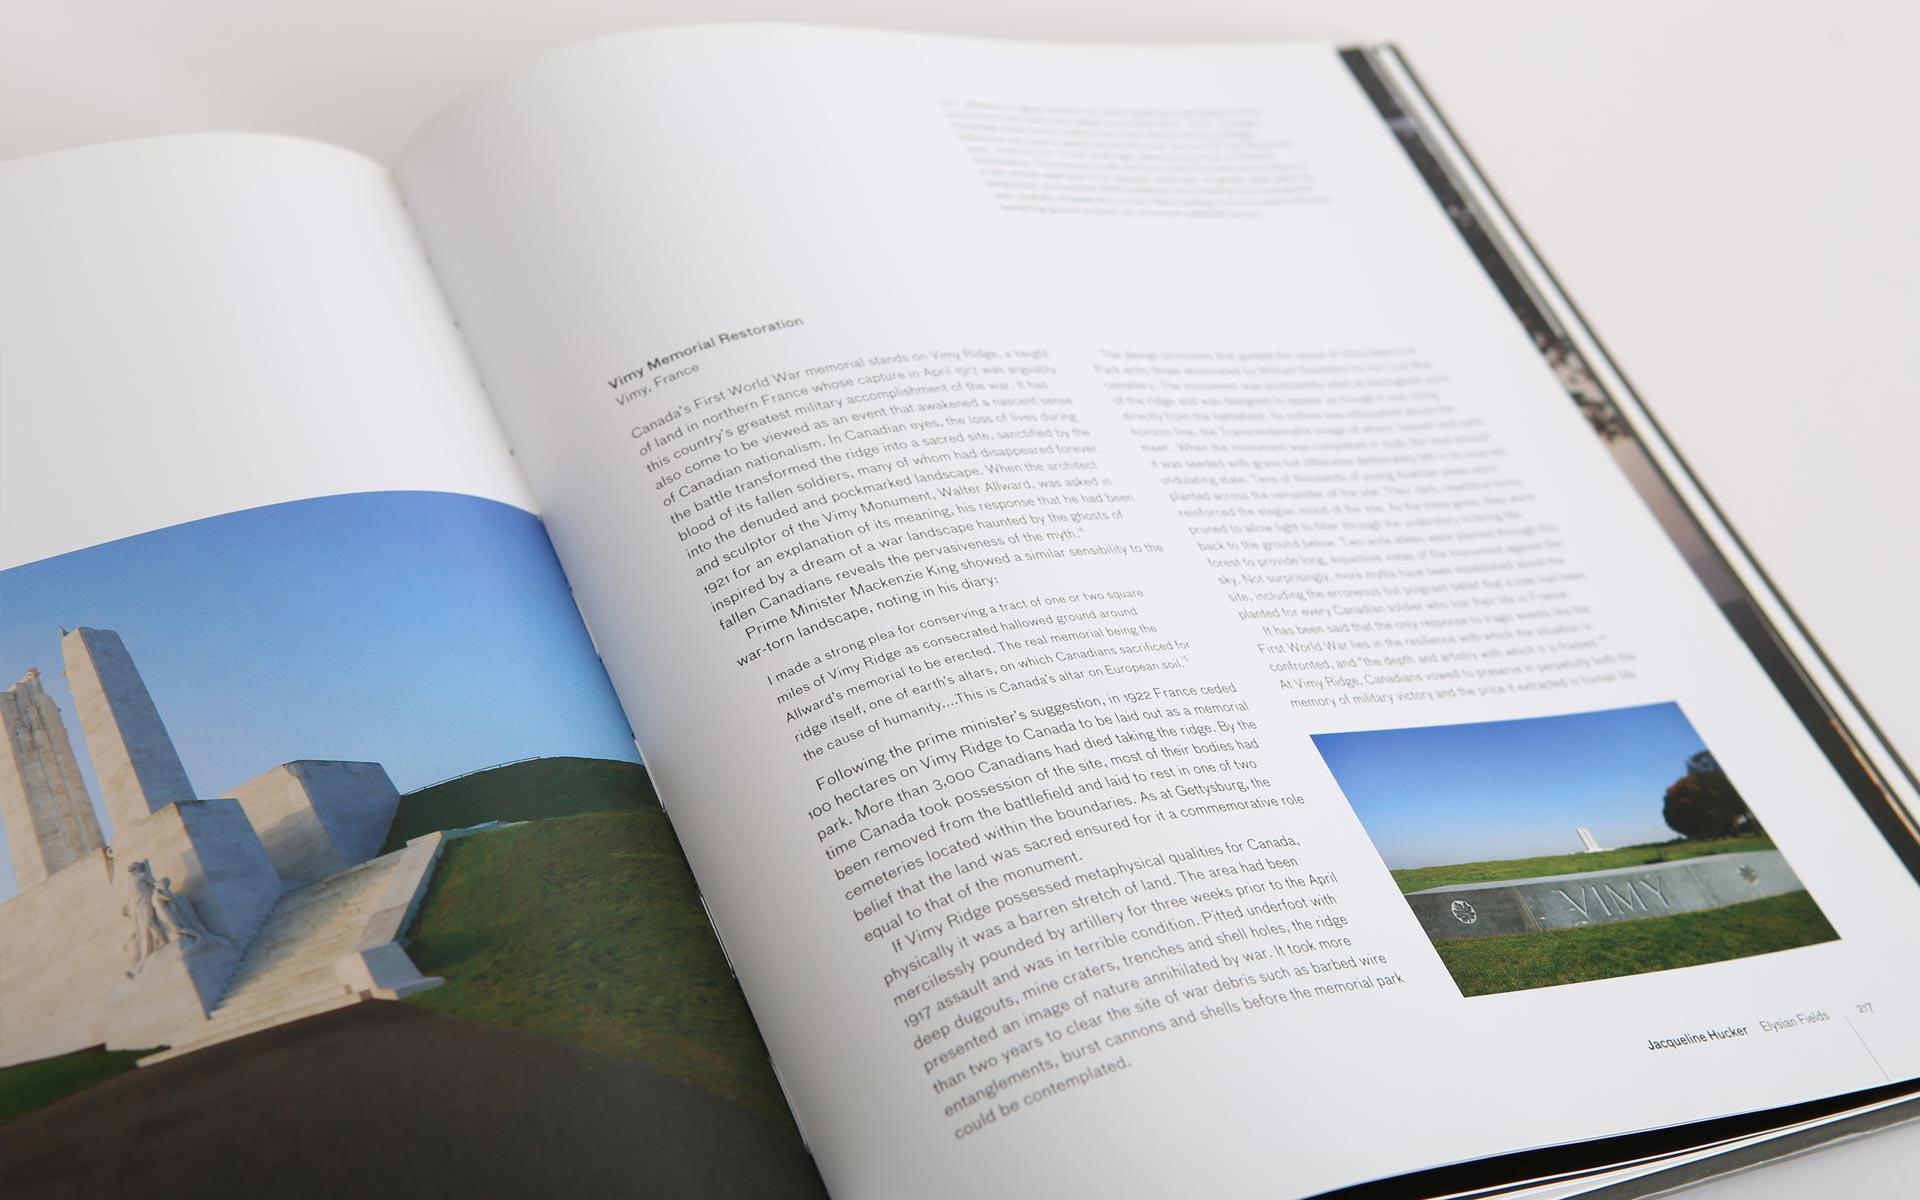 pfs-landscape-architects-book-design-8